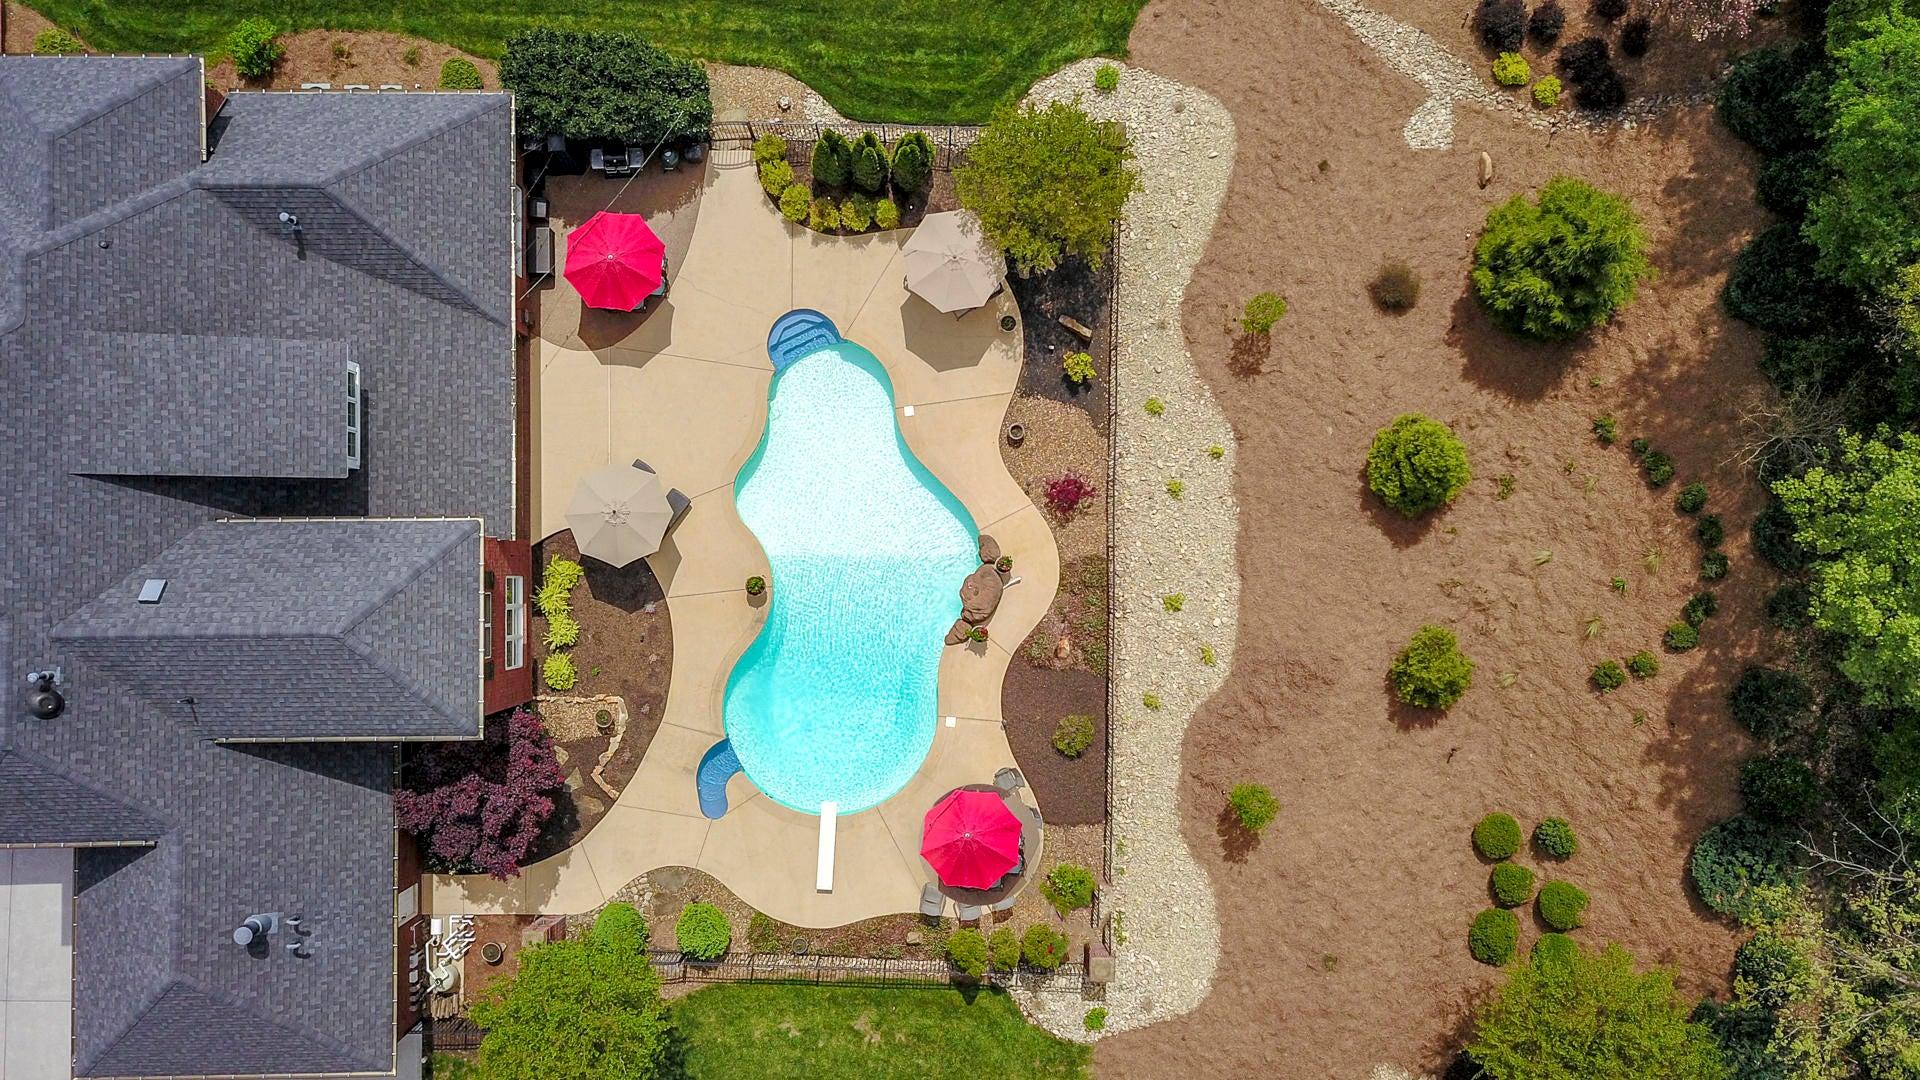 Broadmoor aerial w umbrellas